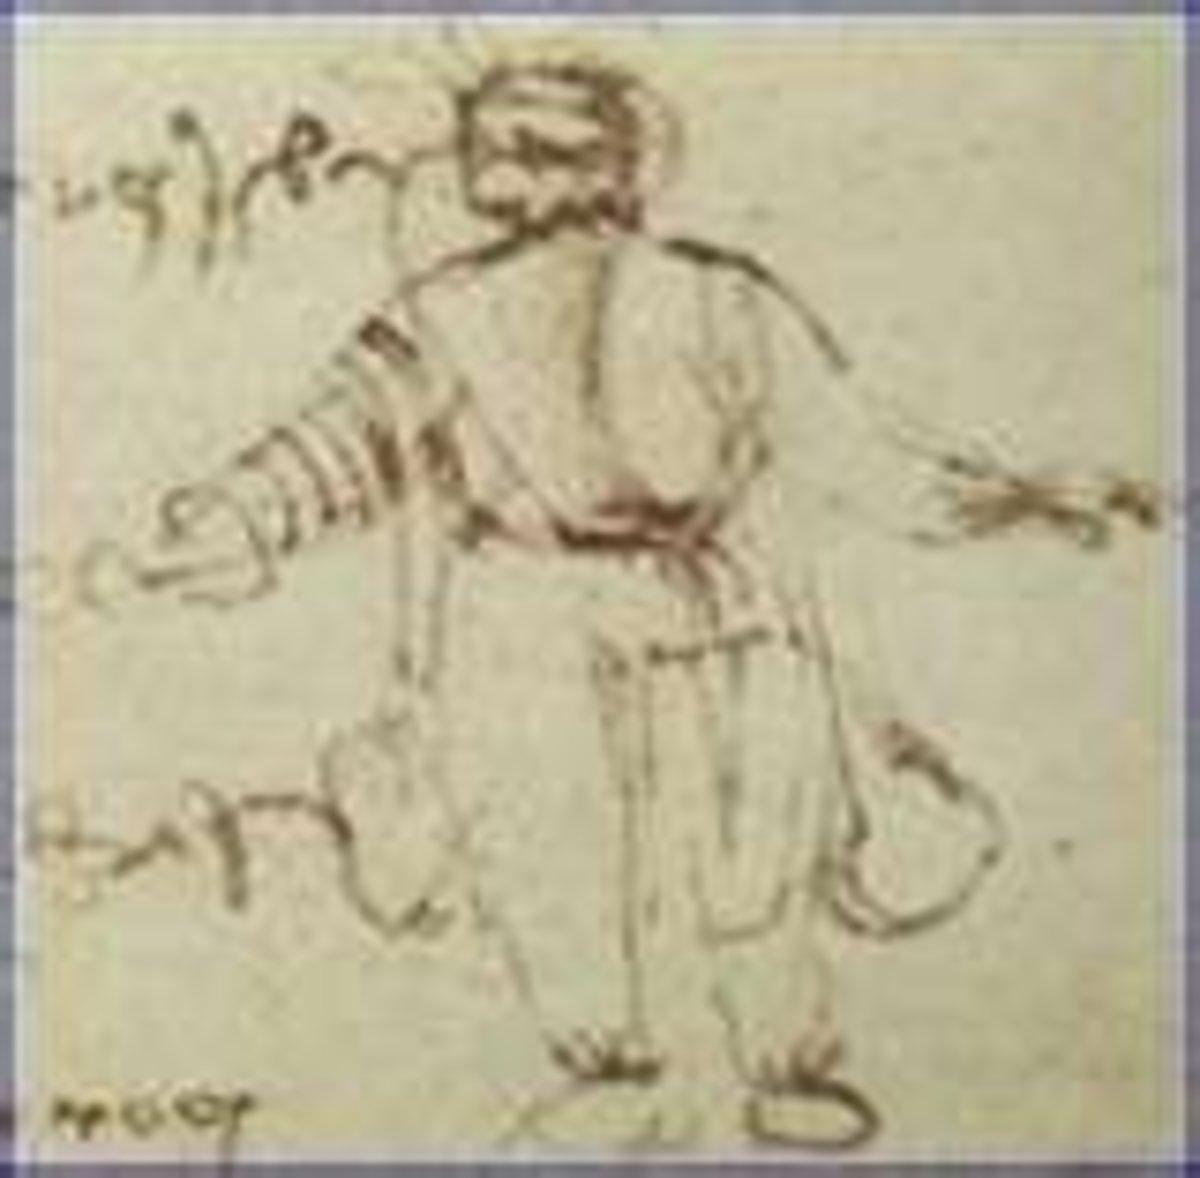 Leonardo's Design for a Diving Suit